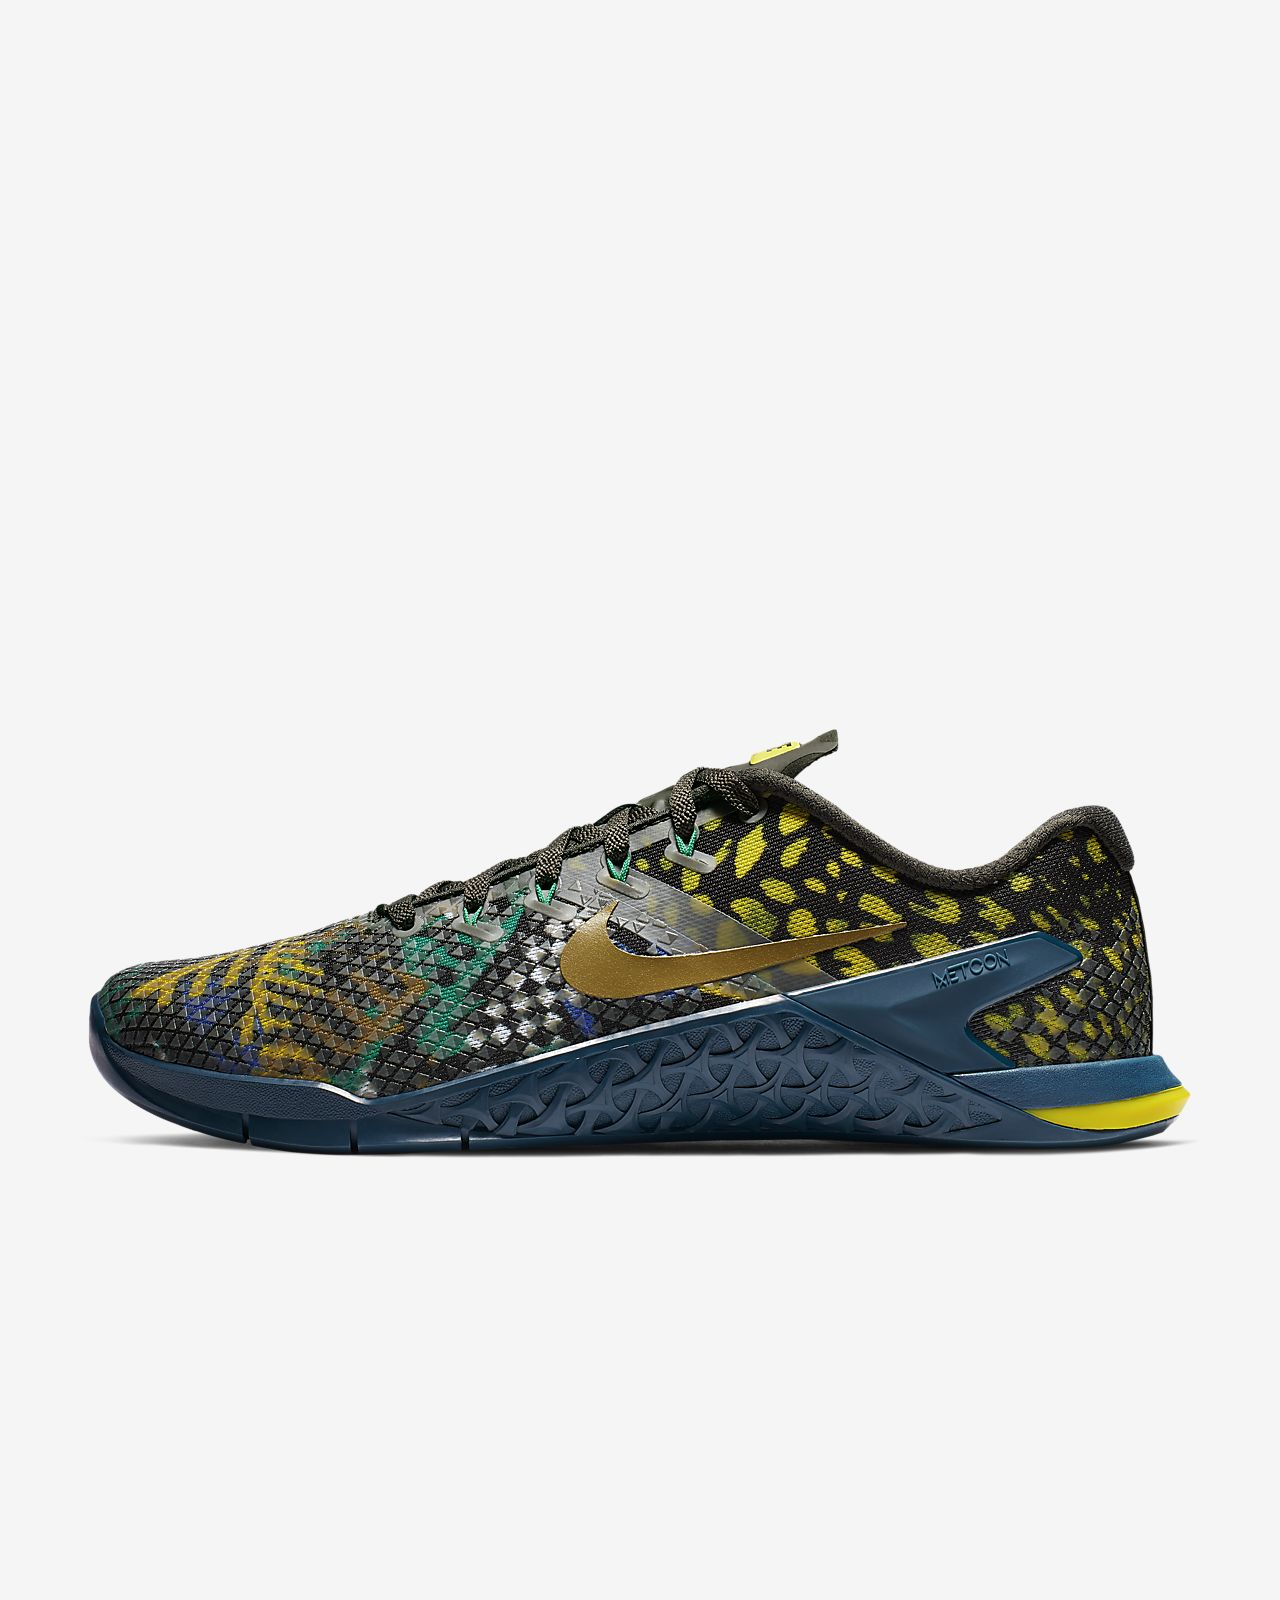 010e798b0 Nike Metcon 4 XD Men s Training Shoe. Nike.com AU